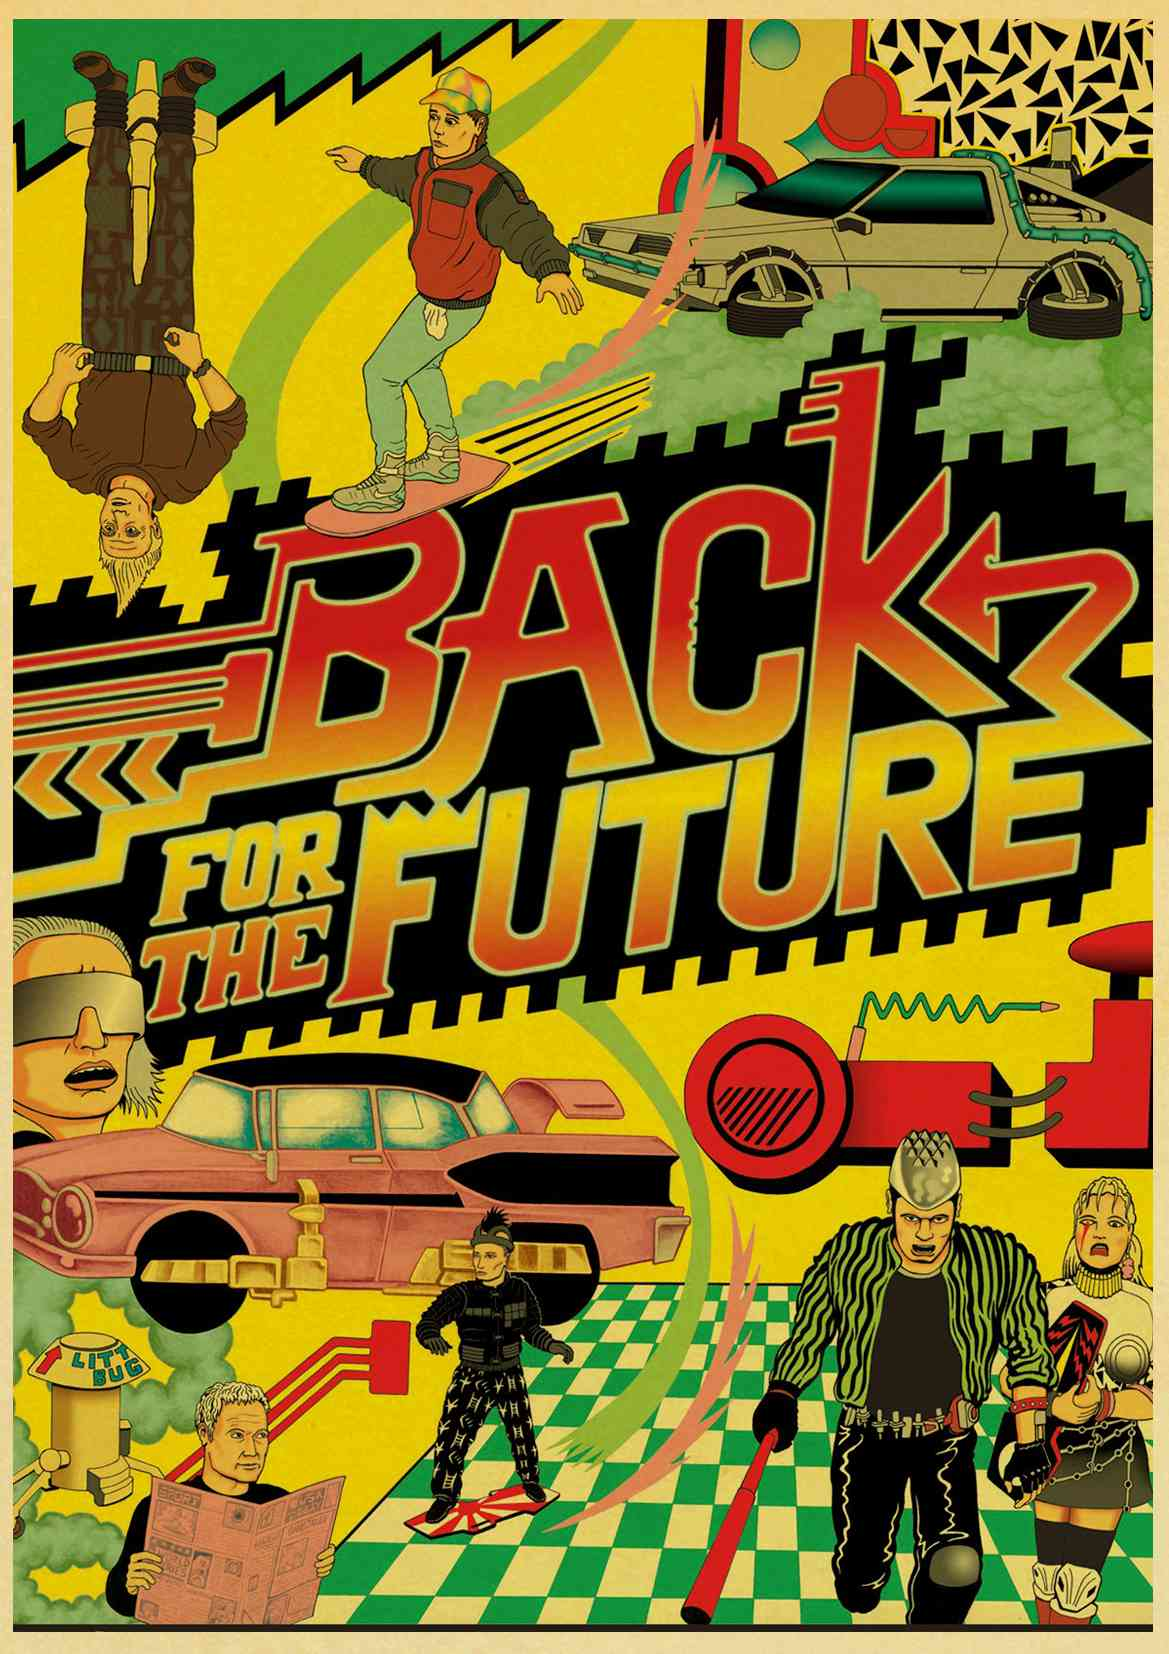 HTB1qRjclgmTBuNjy1Xbq6yMrVXaR Sci-fi Back to The Future Film Propaganda Retro Kraft Poster Decorative DIY Wall Canvas Sticker Home Bar Art Posters Decor